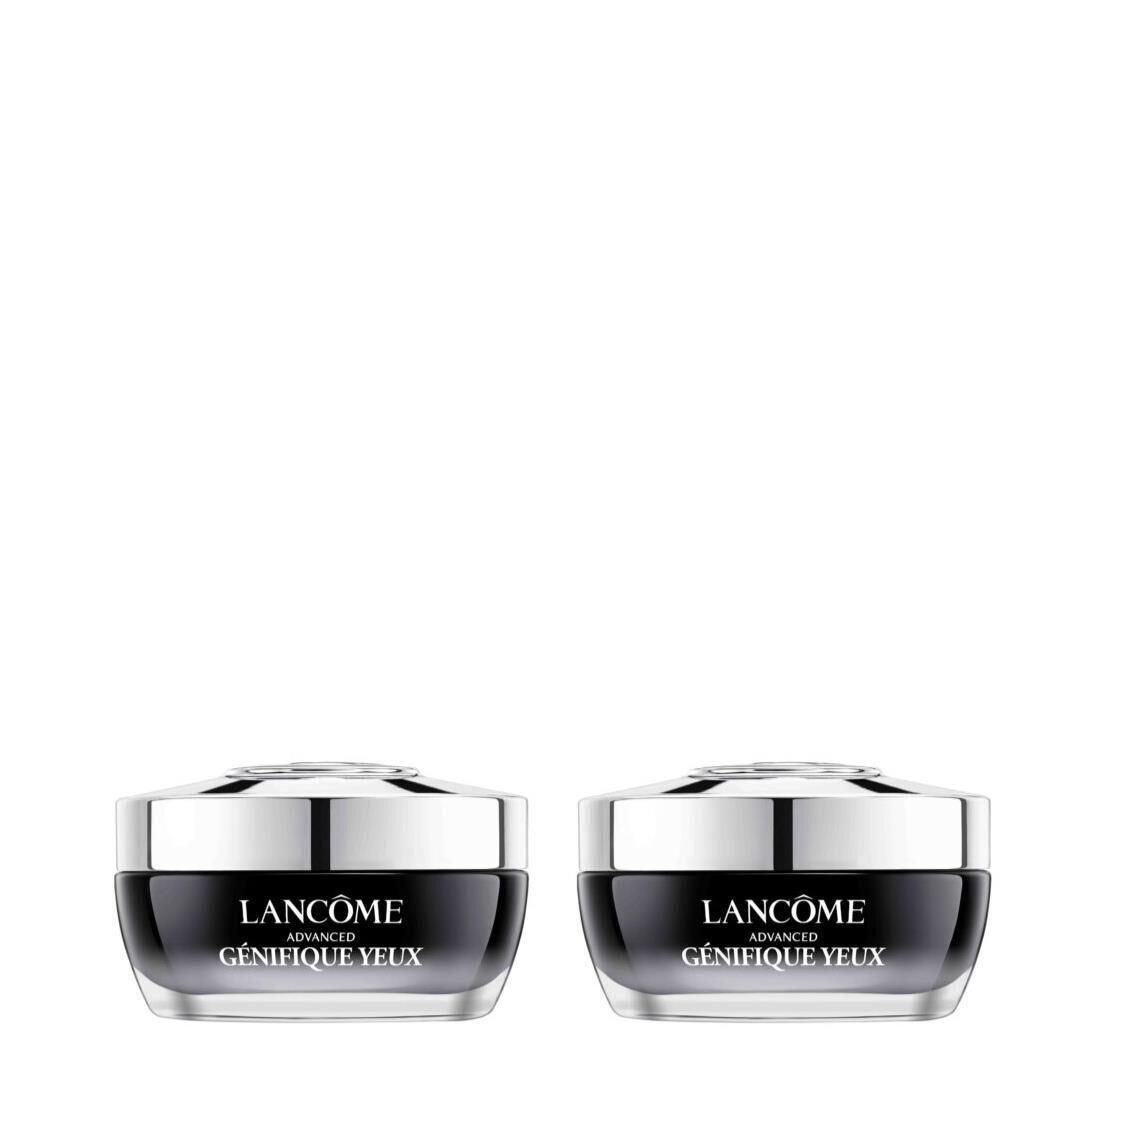 Lancome Advanced Gnifique Eye Cream Duo Set worth 220